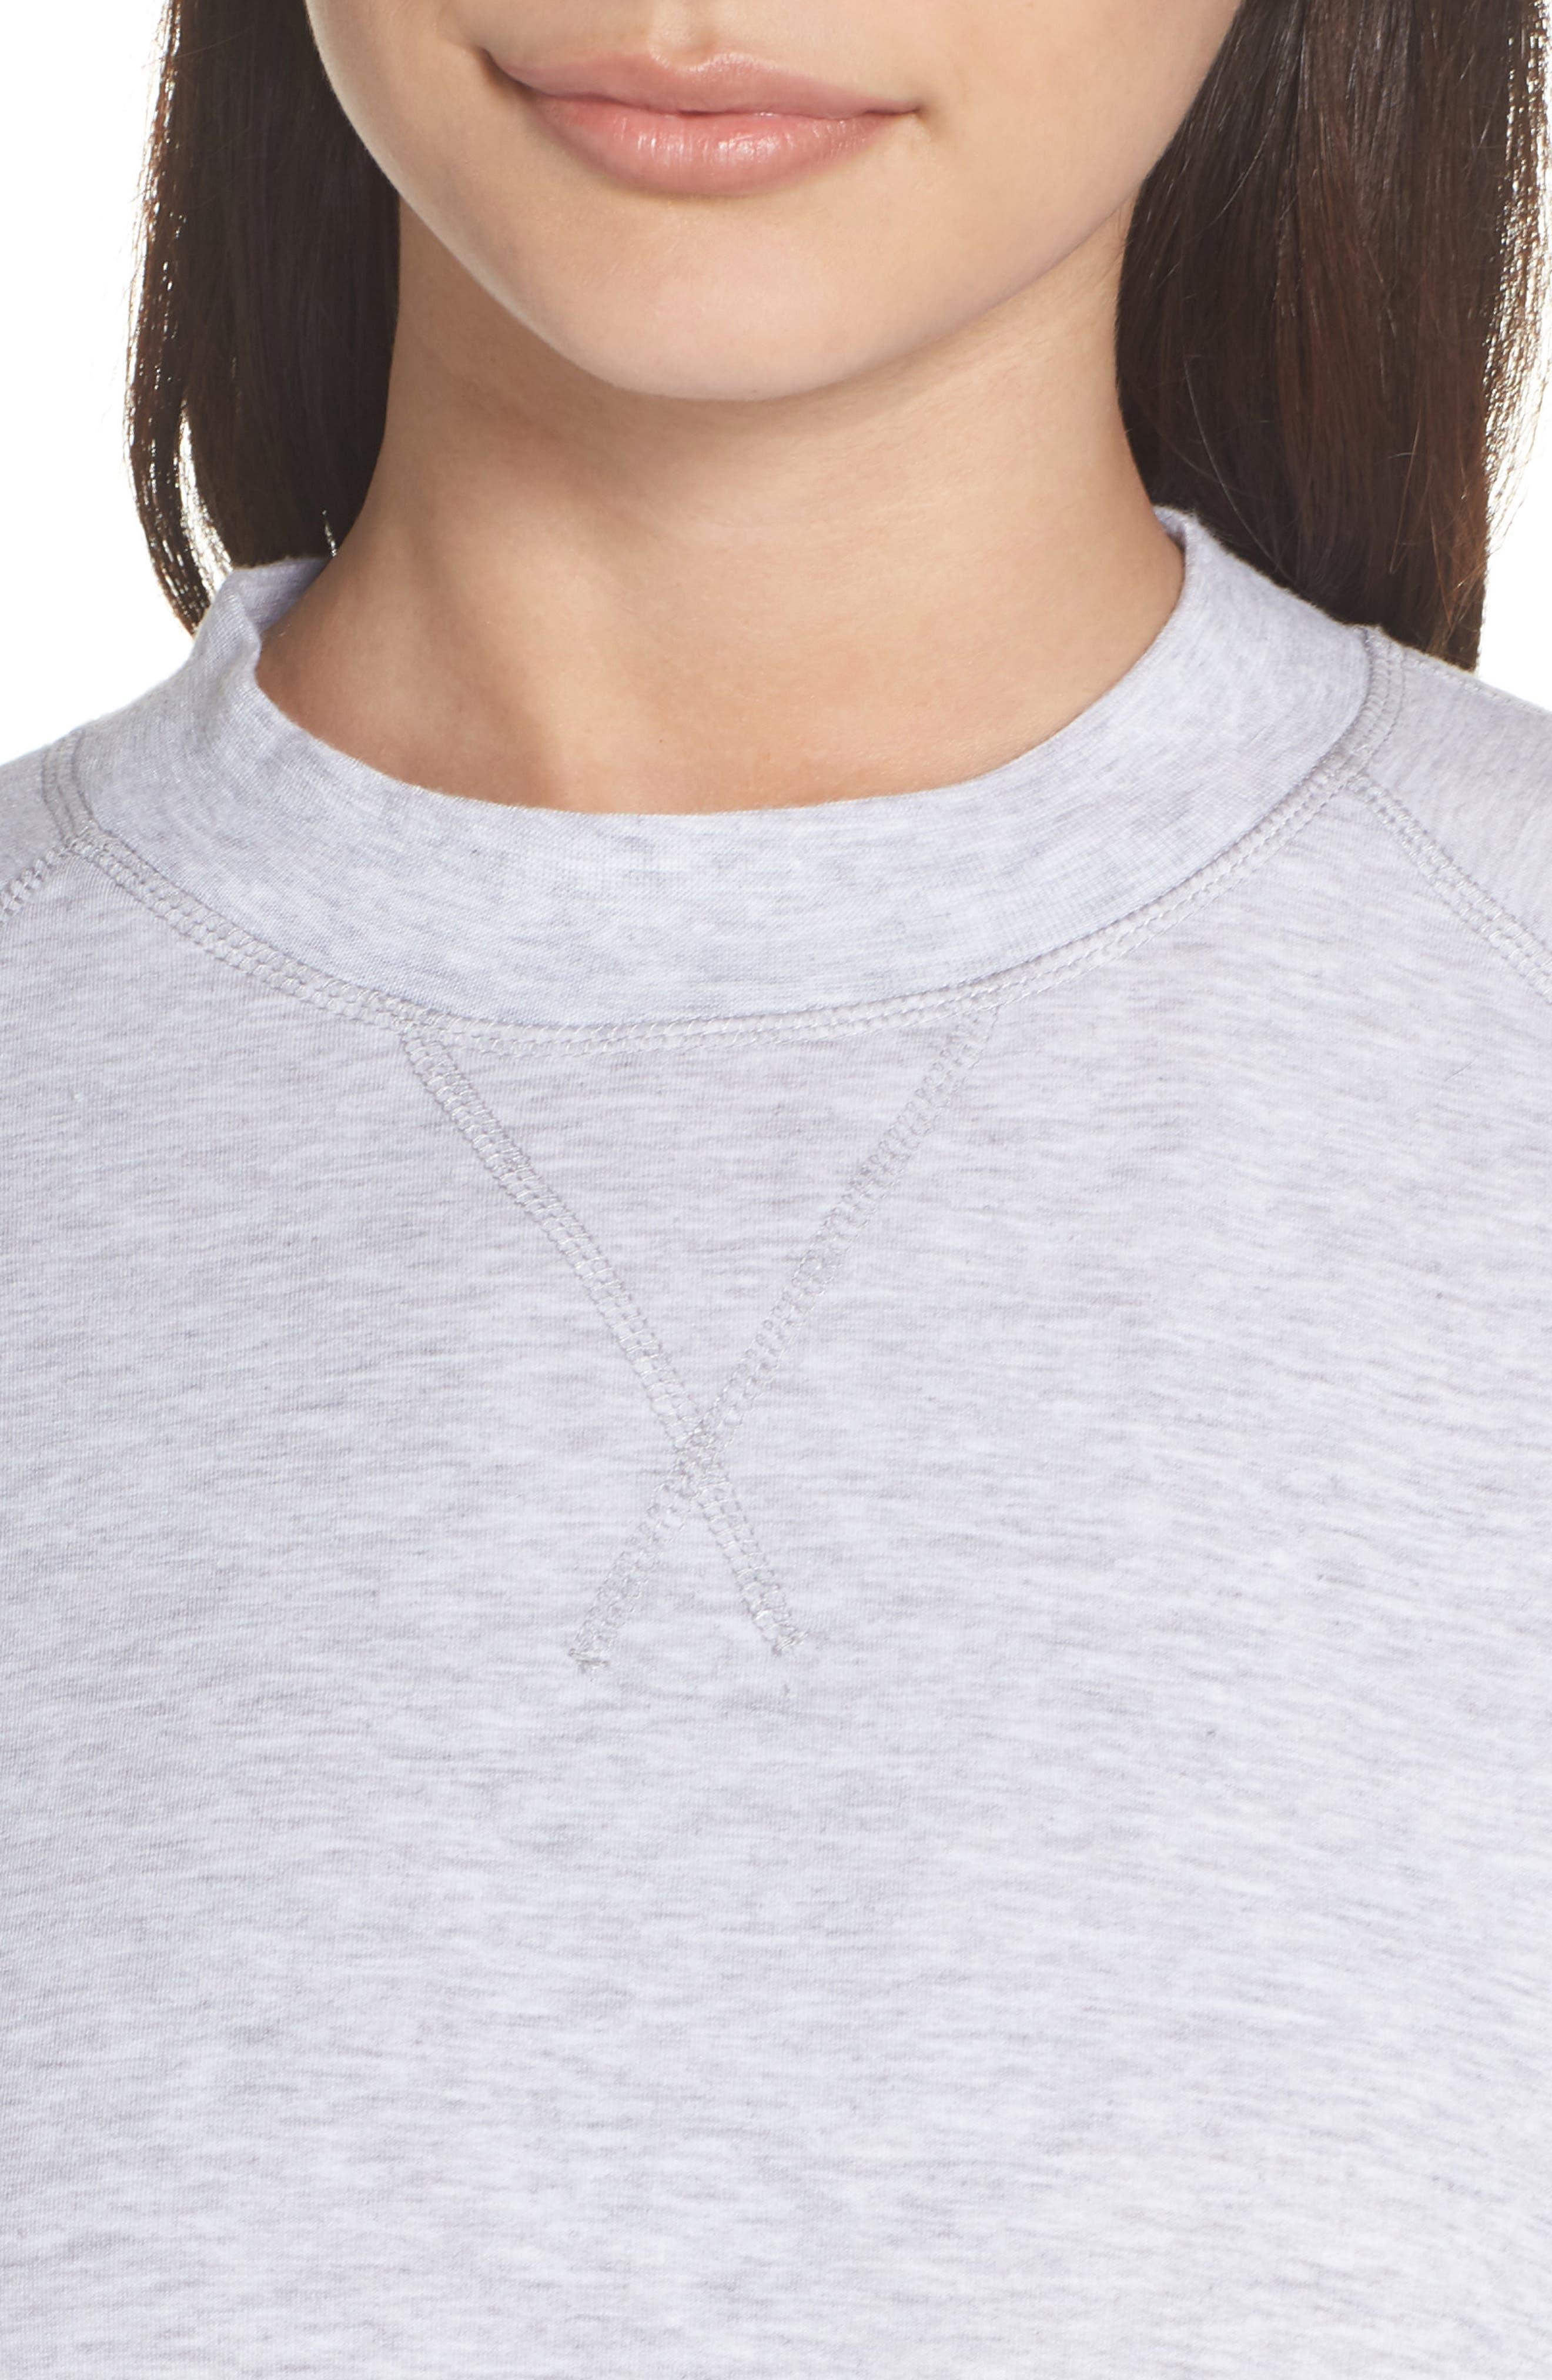 Cool Touch Sweatshirt,                             Alternate thumbnail 4, color,                             020